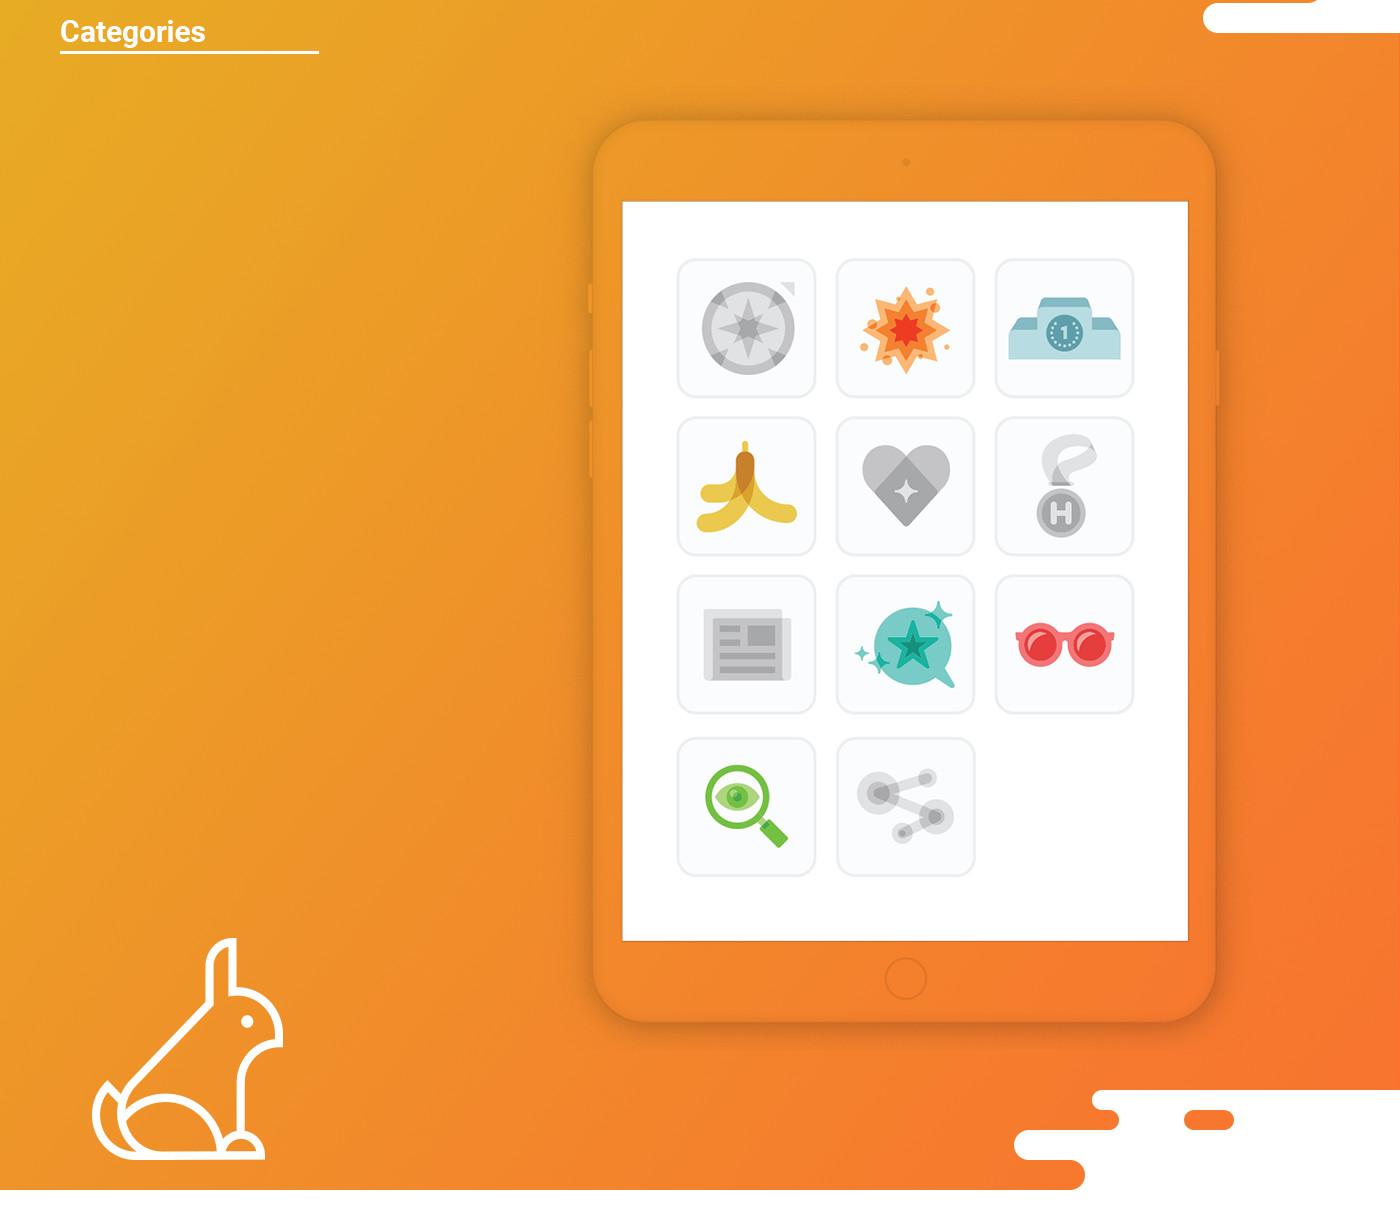 Application categories design for petsqui